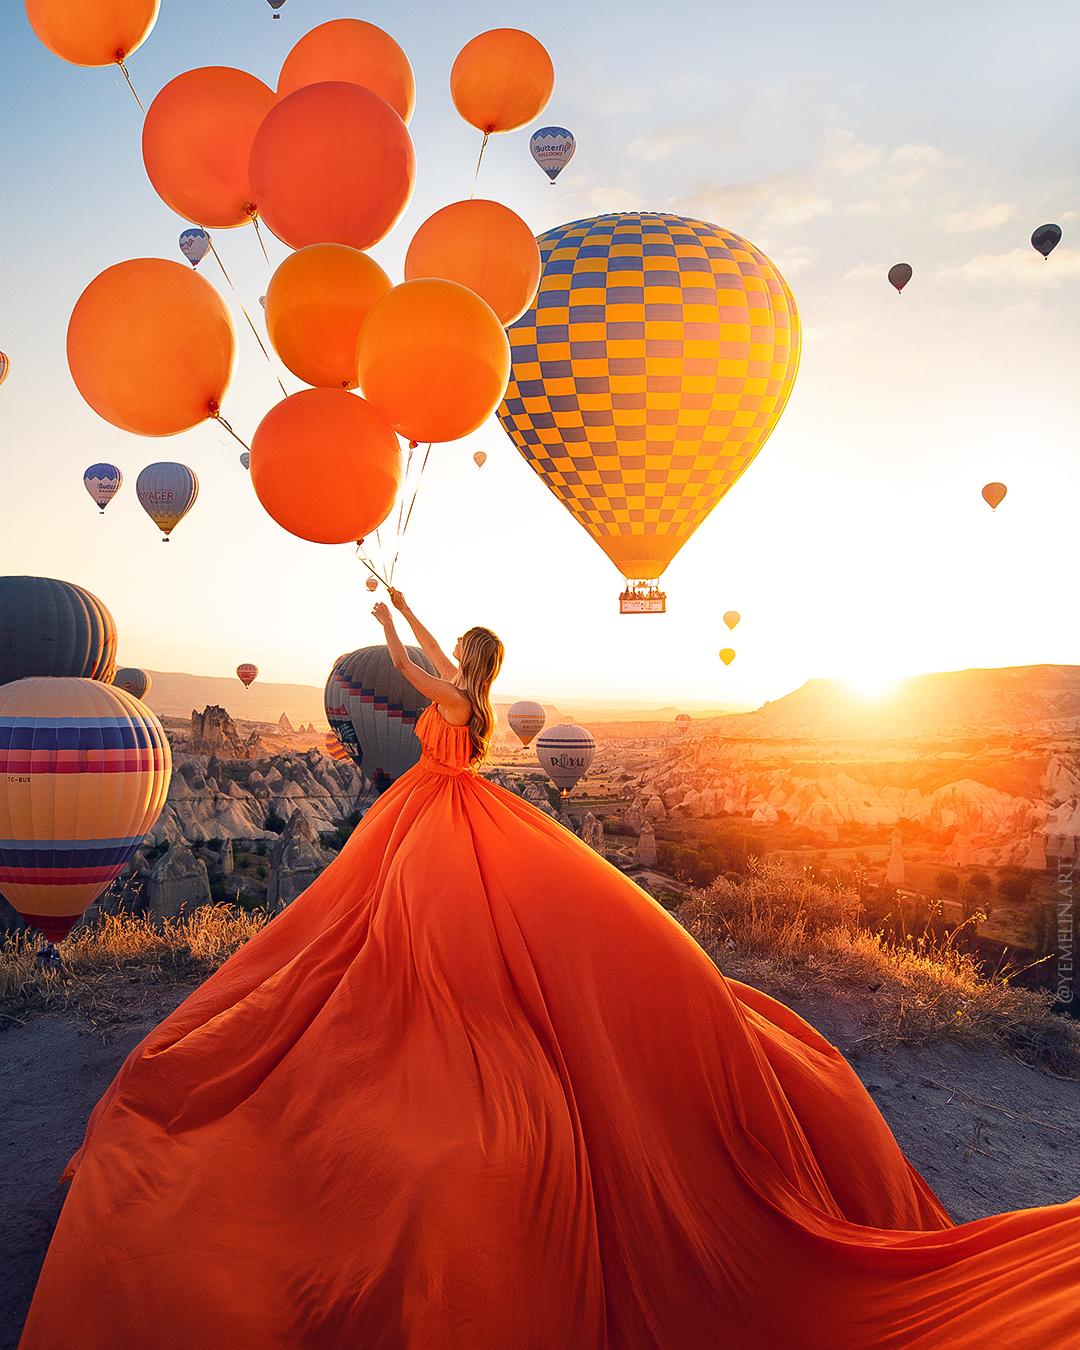 Big Balloons Cappadocia | Balloons photography, Fairytale photography,  Photoshoot poses